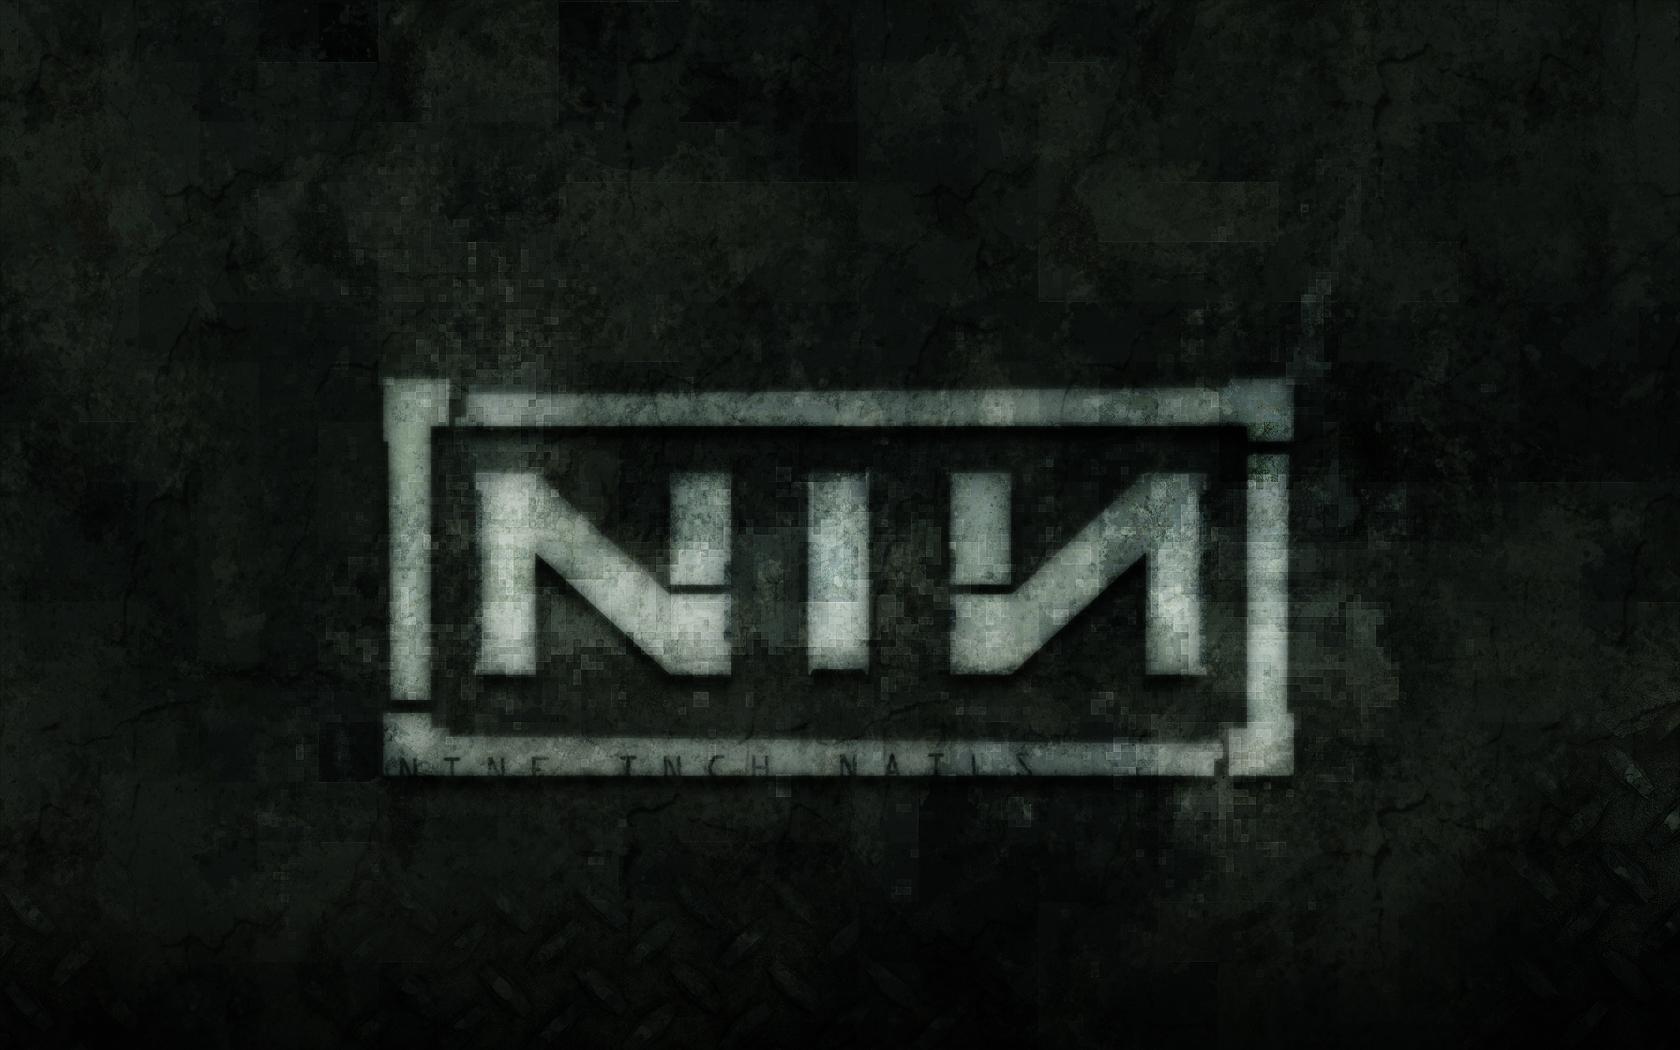 Nine Inch Nails Fondo De Pantalla And Fondo De Escritorio